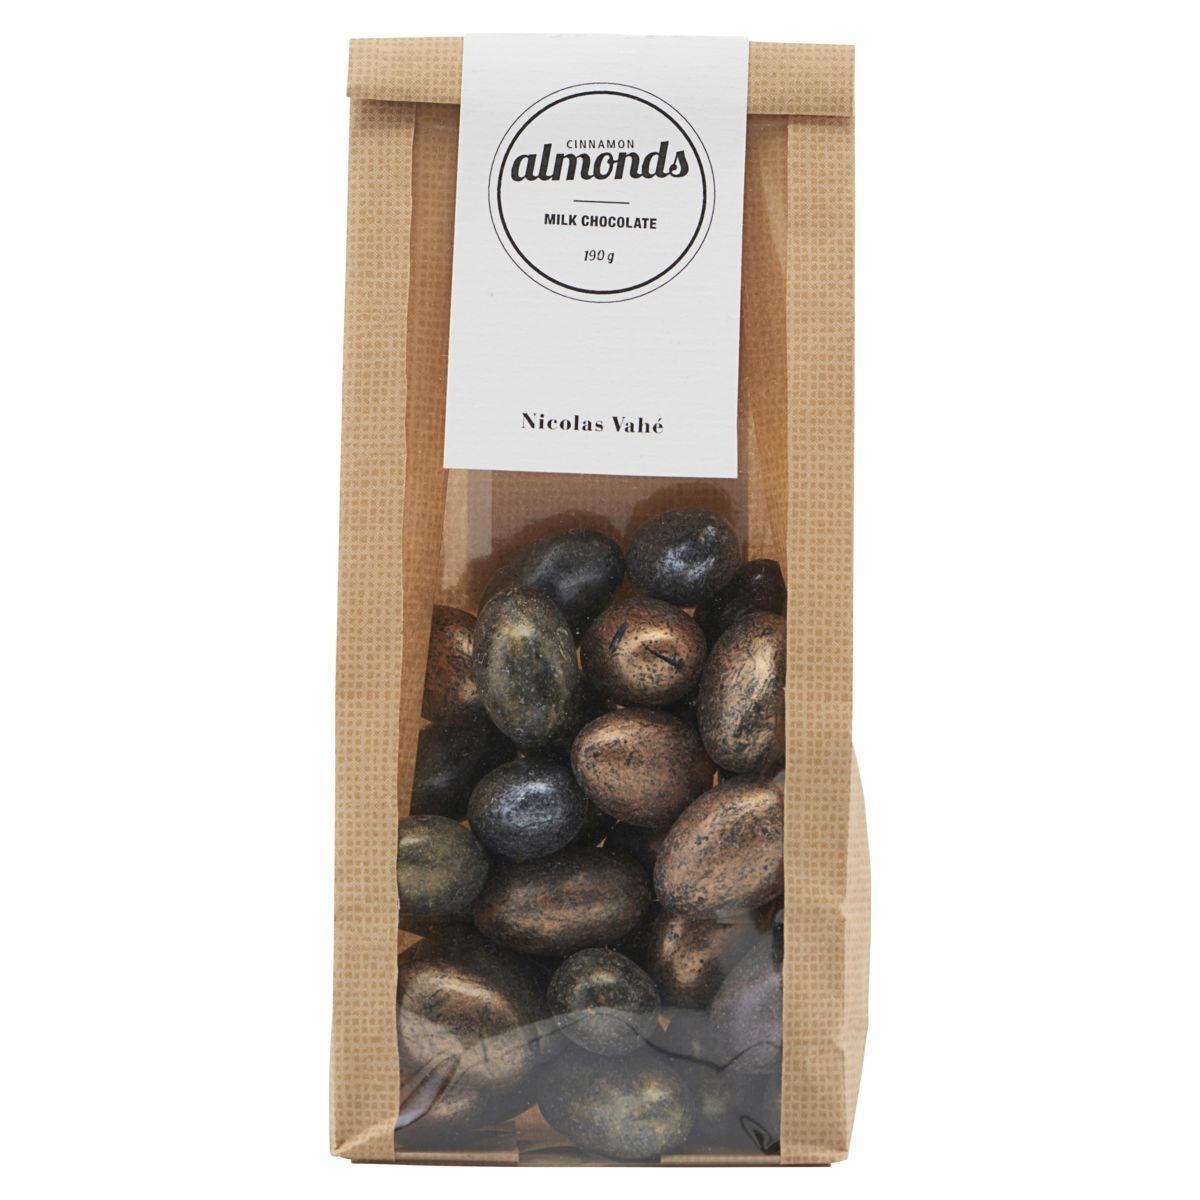 Nicolas Vahé Mandle v hořké čokoládě se skořicí 190 g, hnědá barva